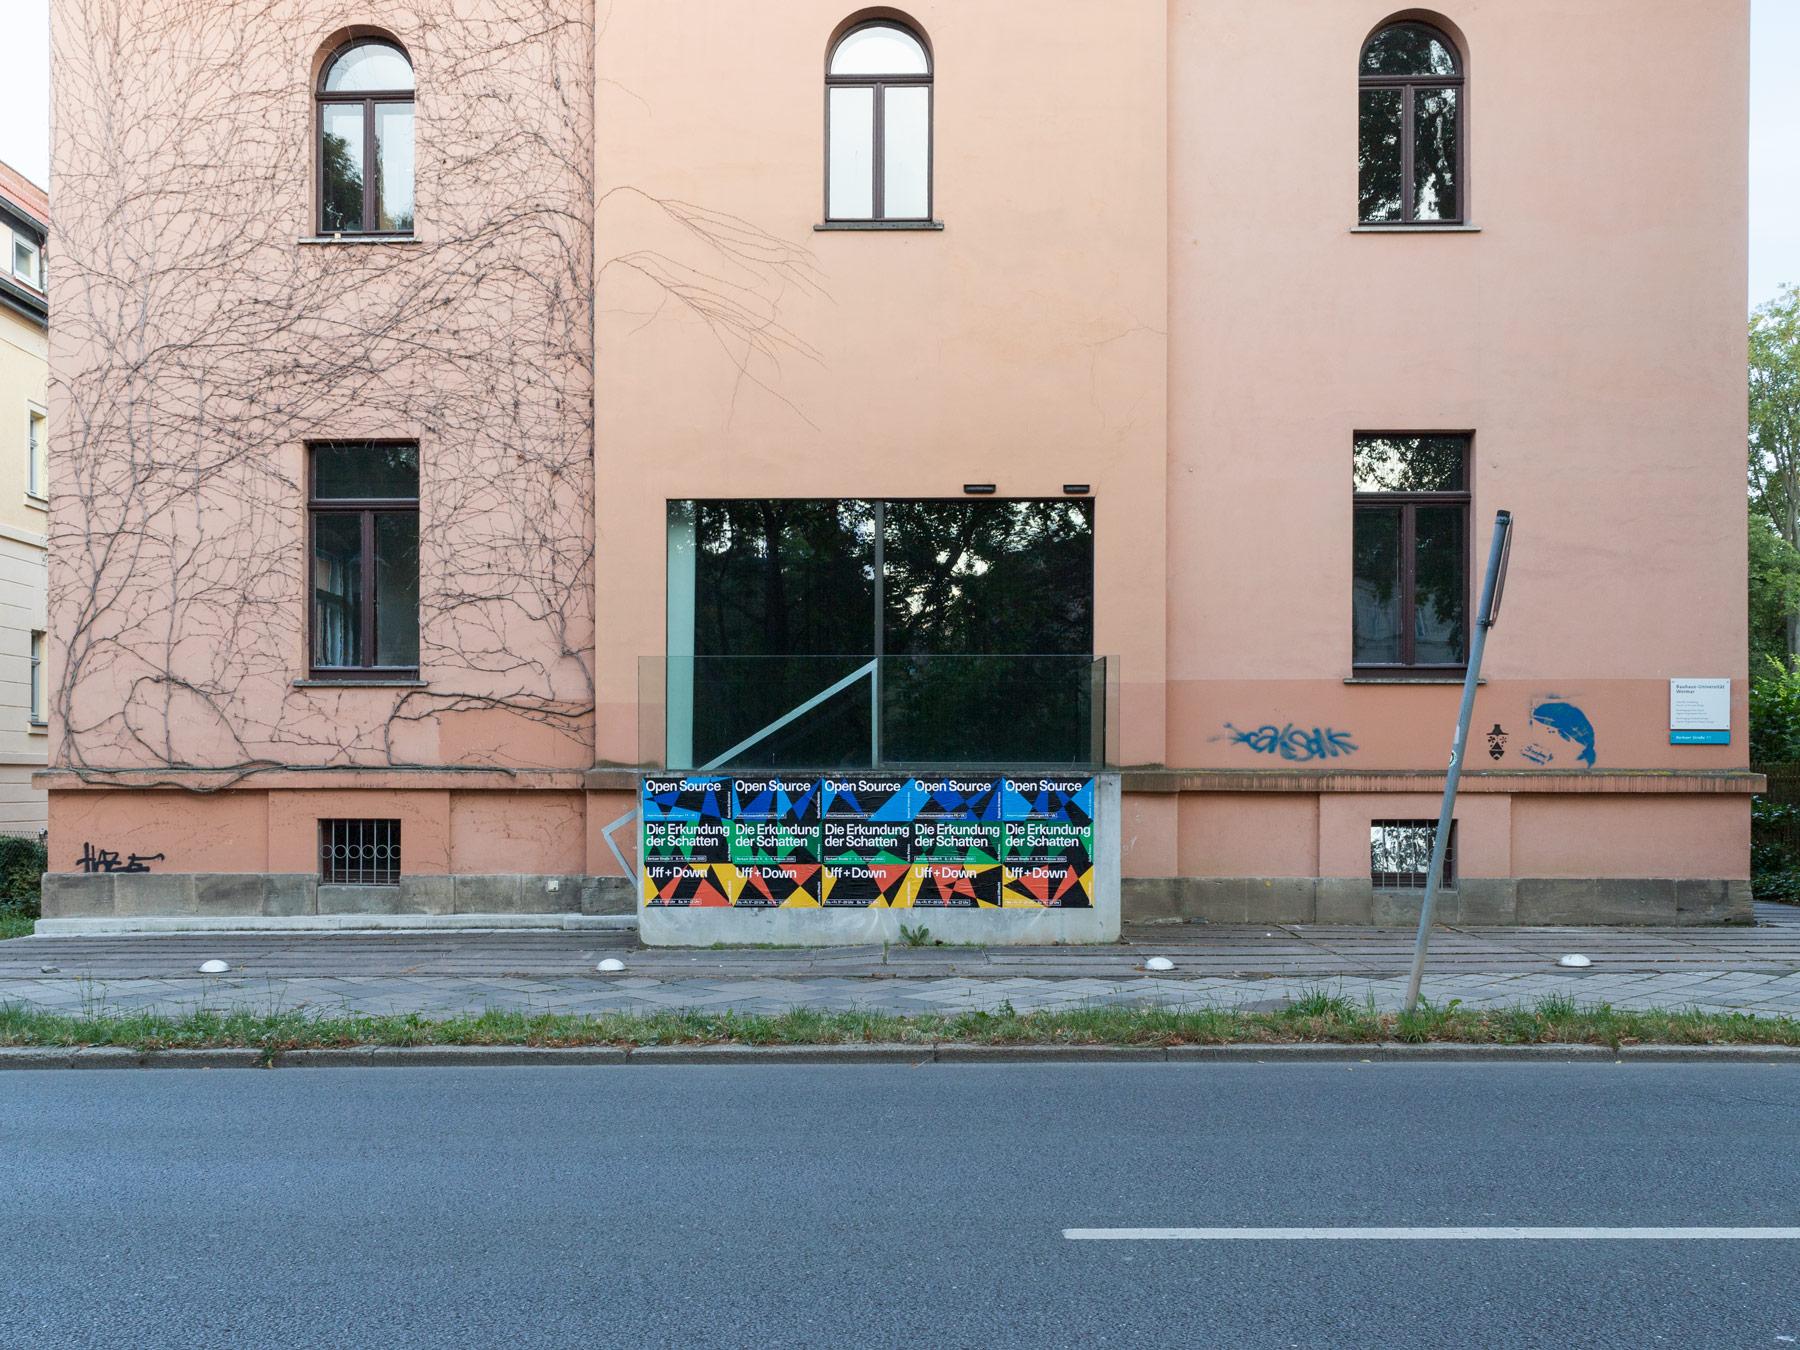 Kralenetz/Peters/Uffrecht